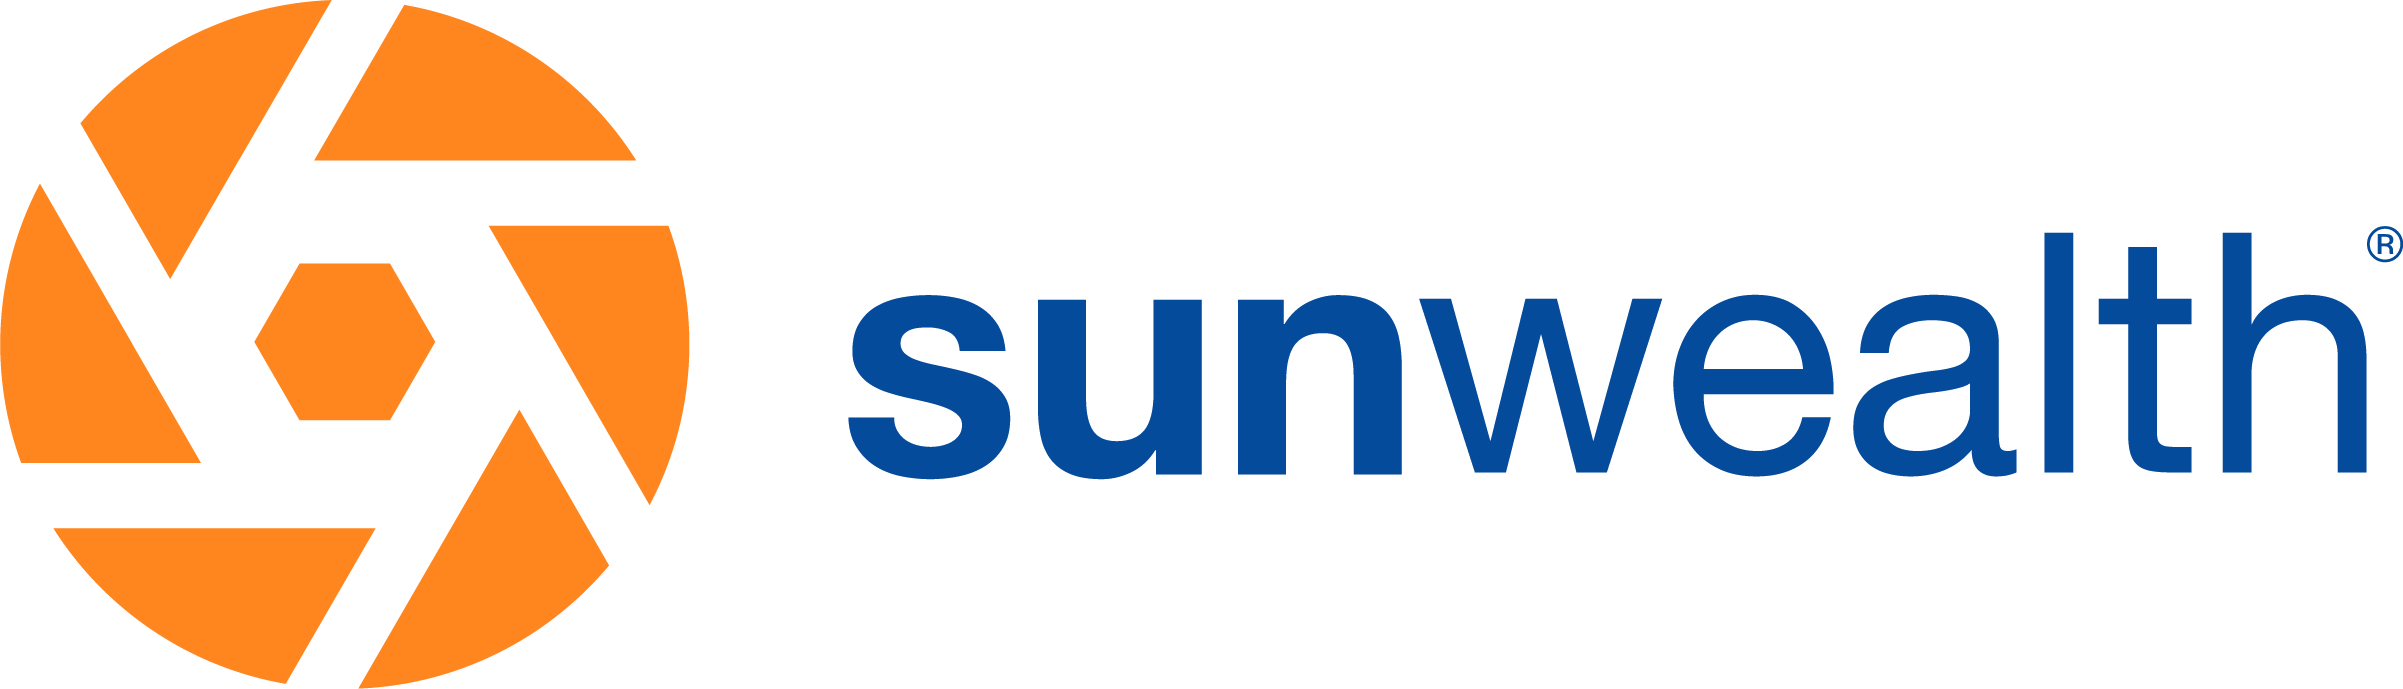 Sunwealth_2Color